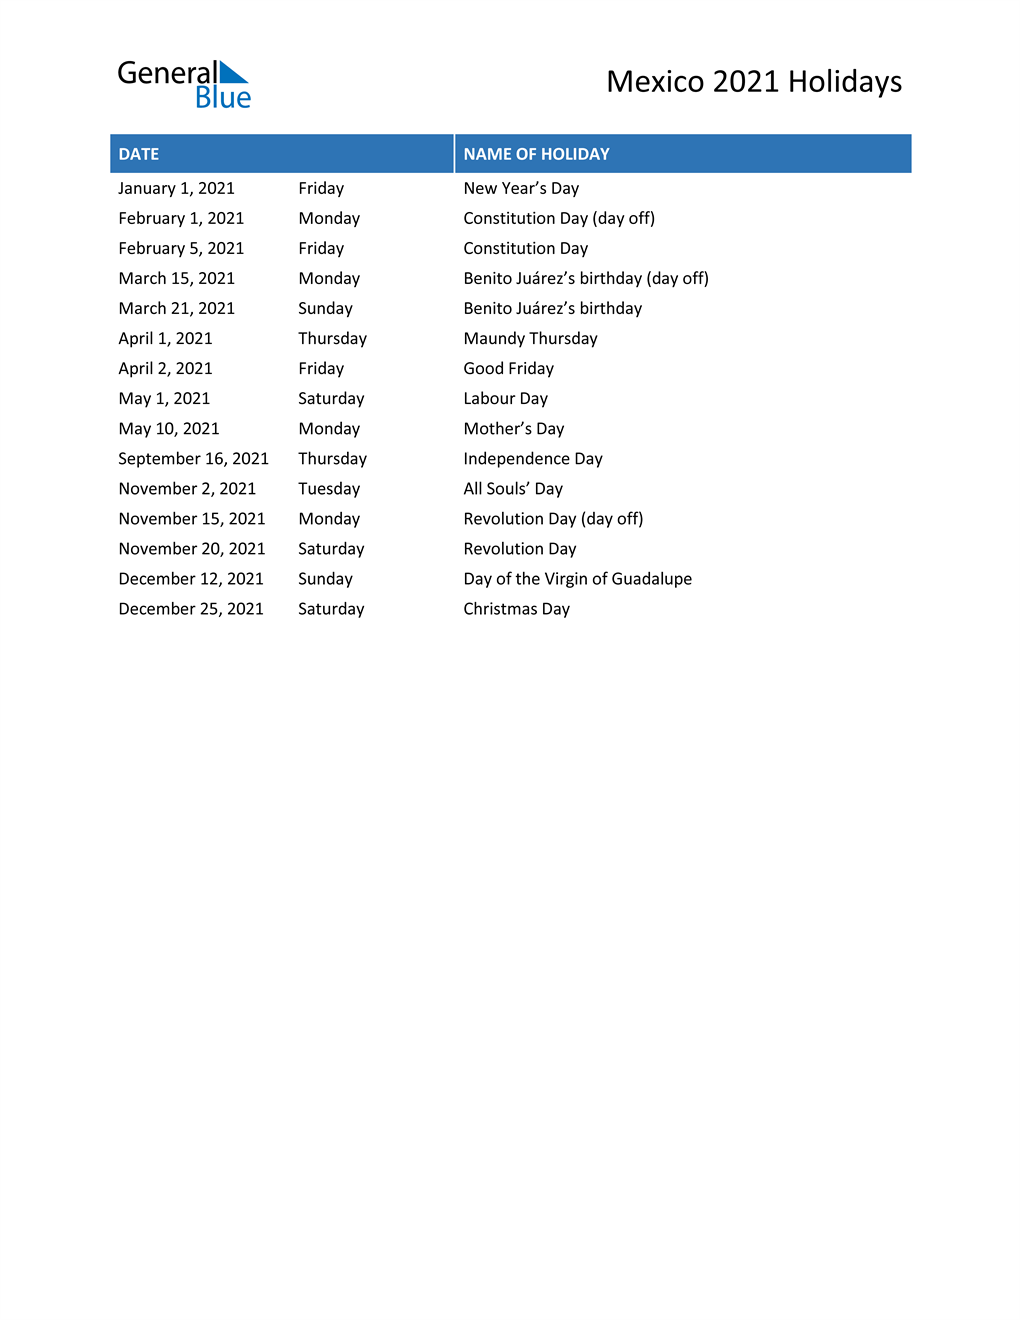 Mexico Holidays 2021 - Printable, Pdf, Word And Excel Regarding Calendar With November 2021 Mexican Names